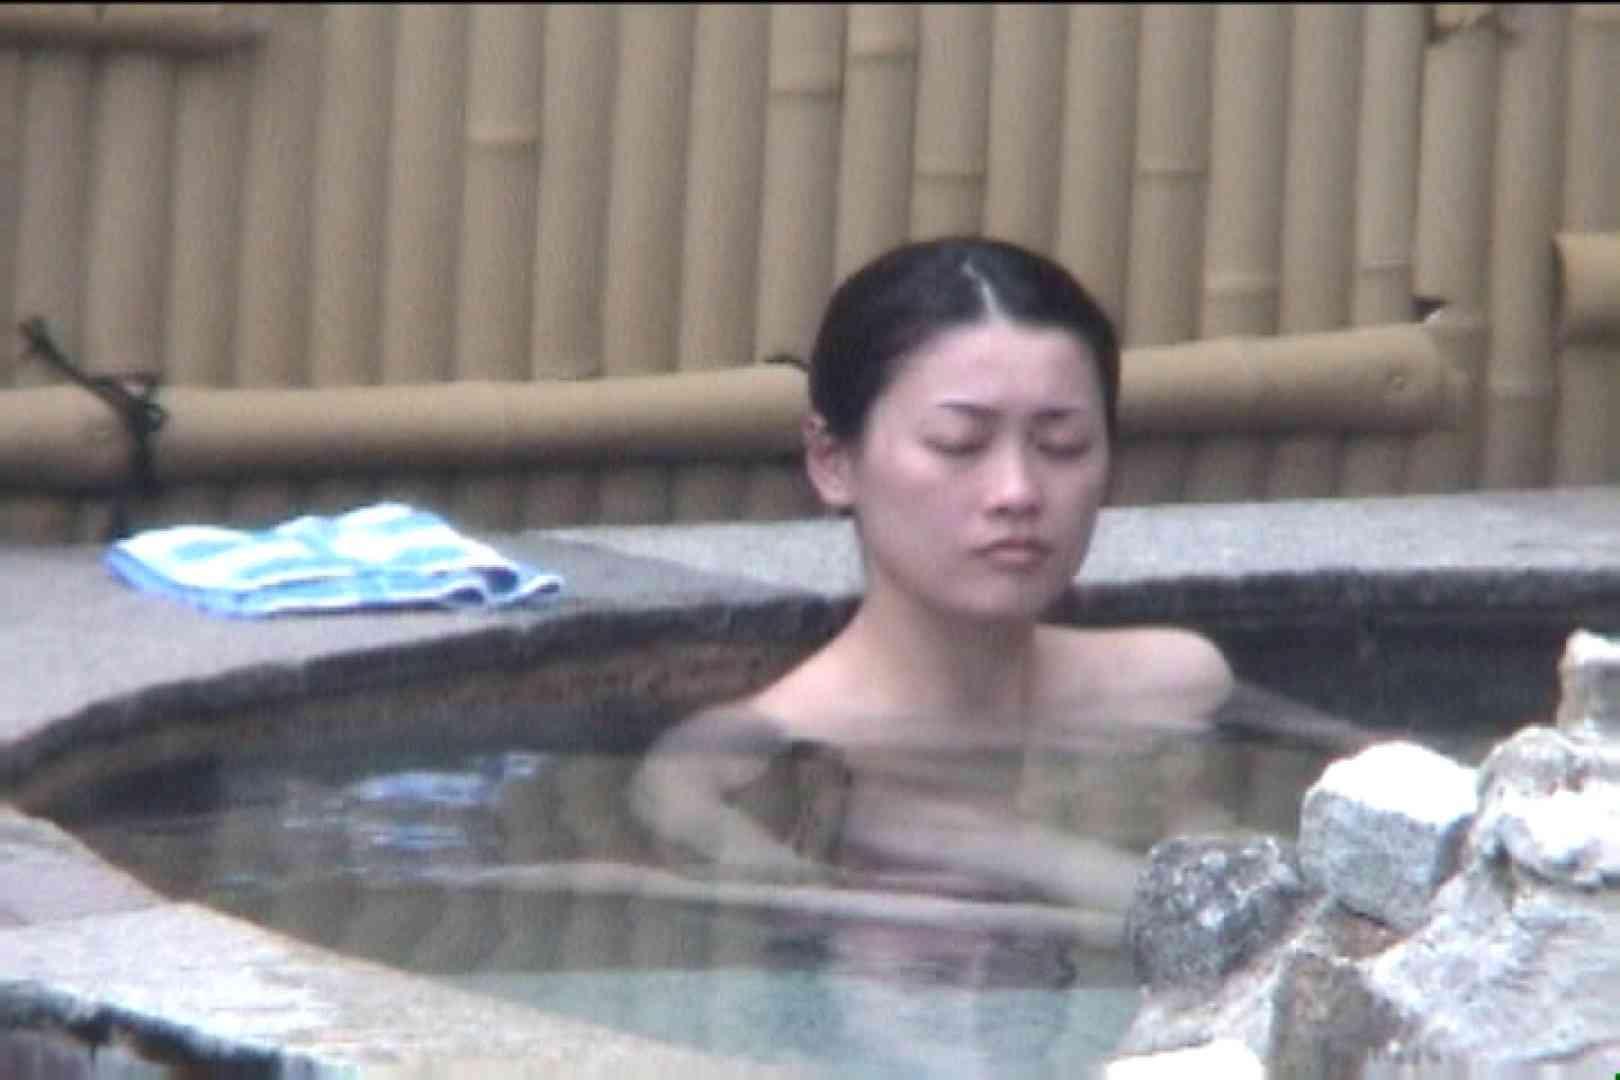 Aquaな露天風呂Vol.92【VIP限定】 盗撮 | OLのエロ生活  33連発 28